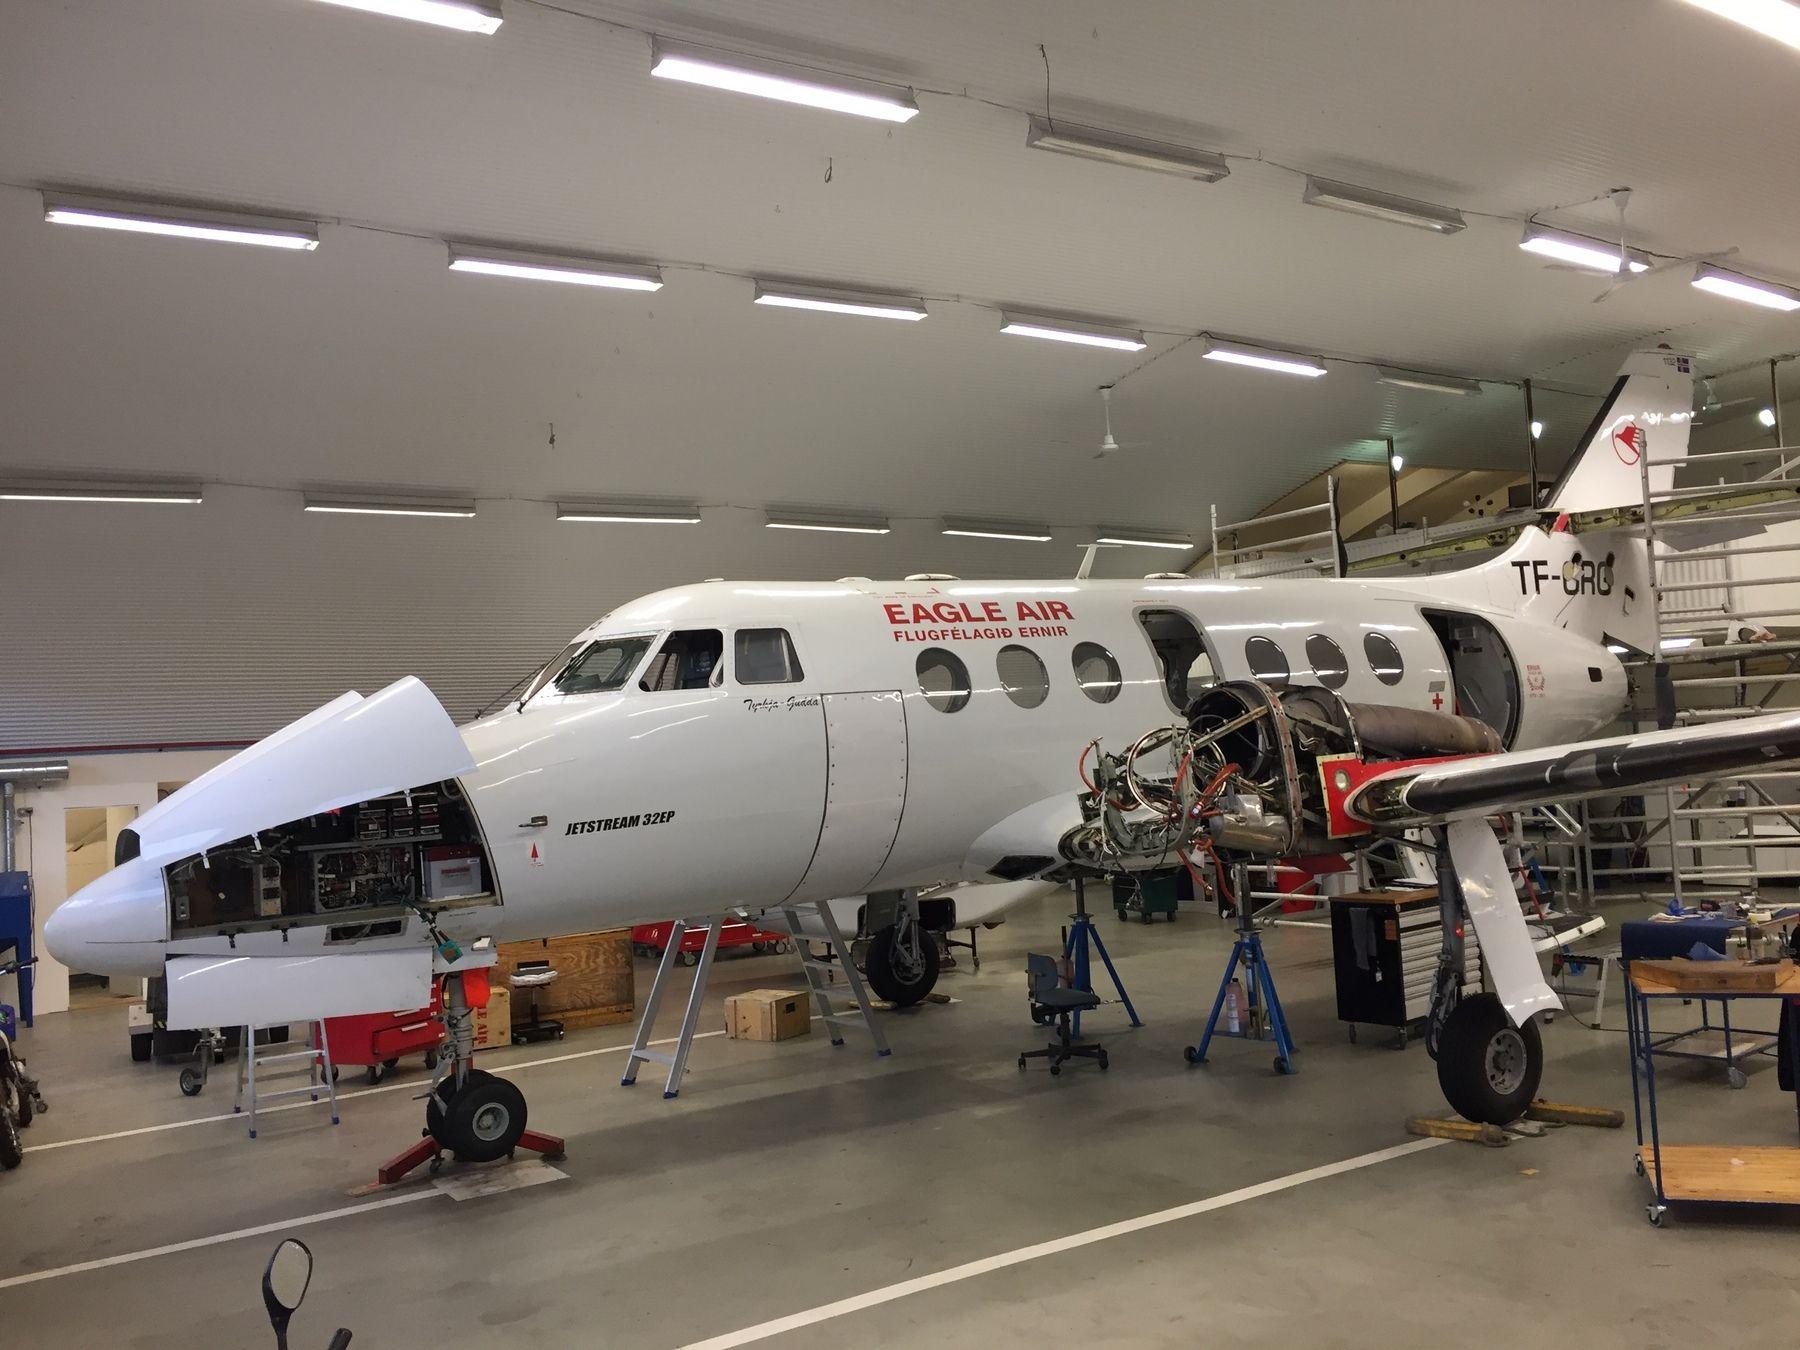 1996 BAe Jetstream 32 for sale in Iceland => www